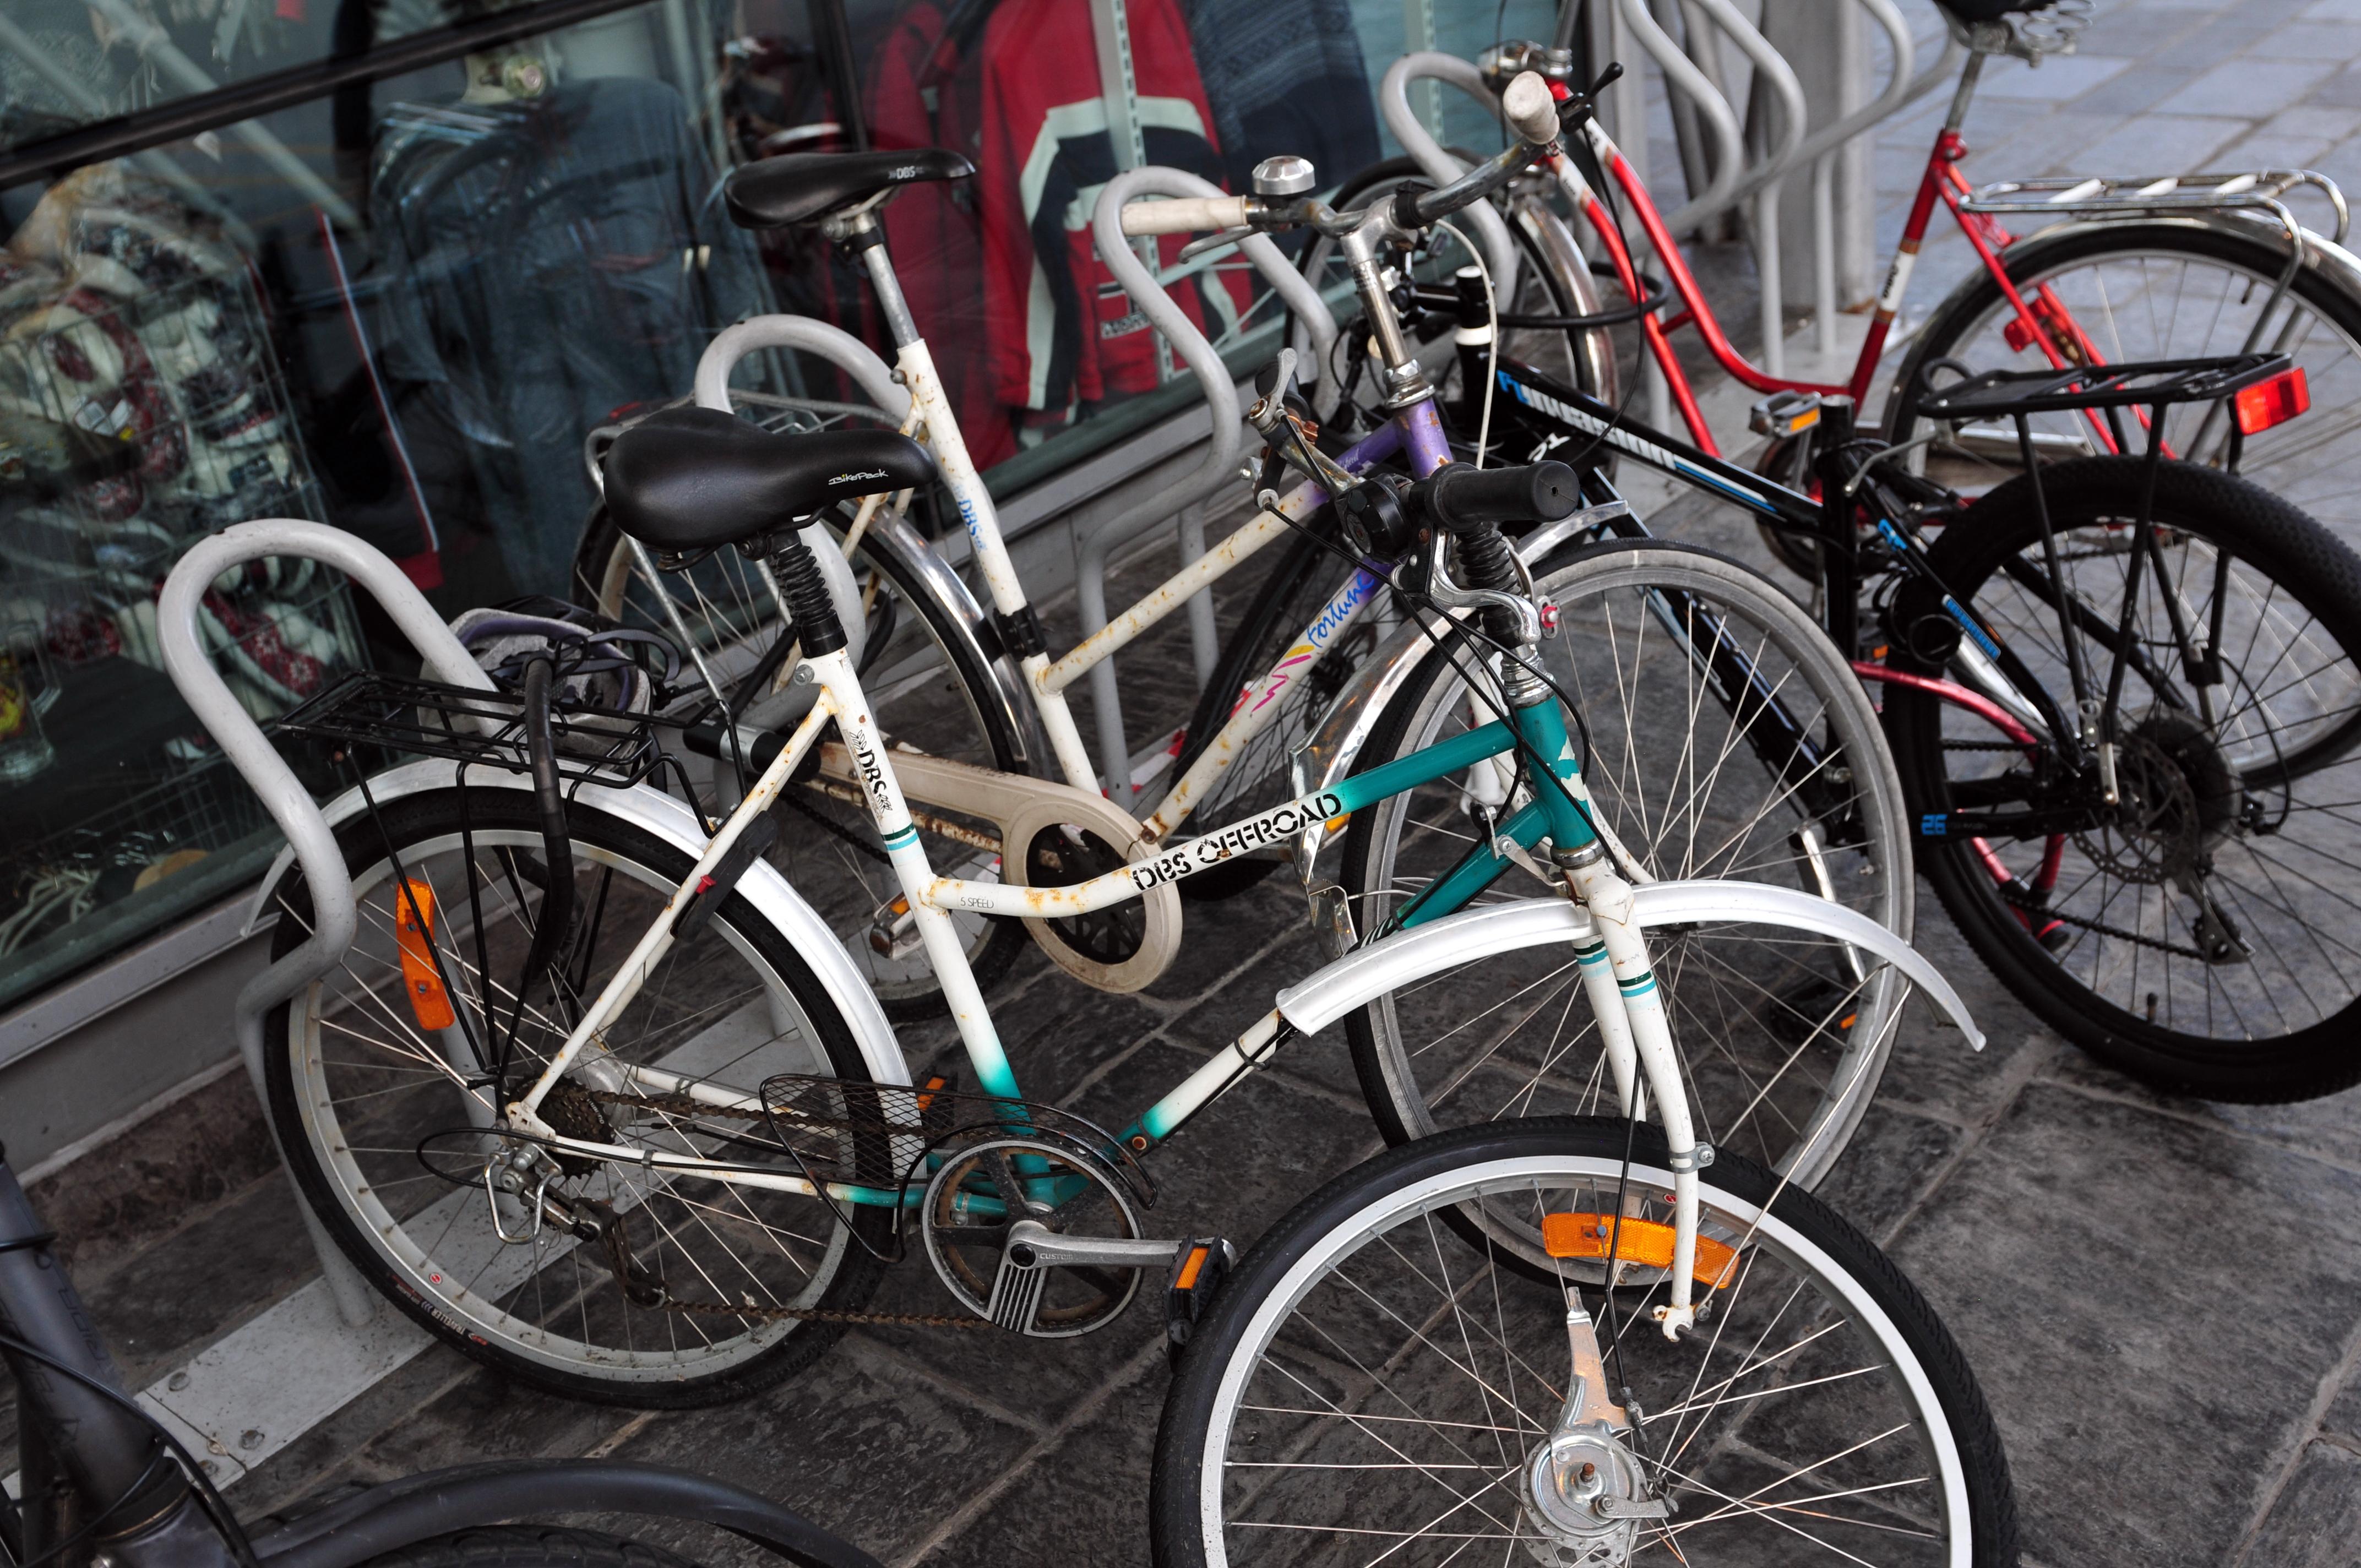 14-09-02-fahrrad-oslo-53.jpg